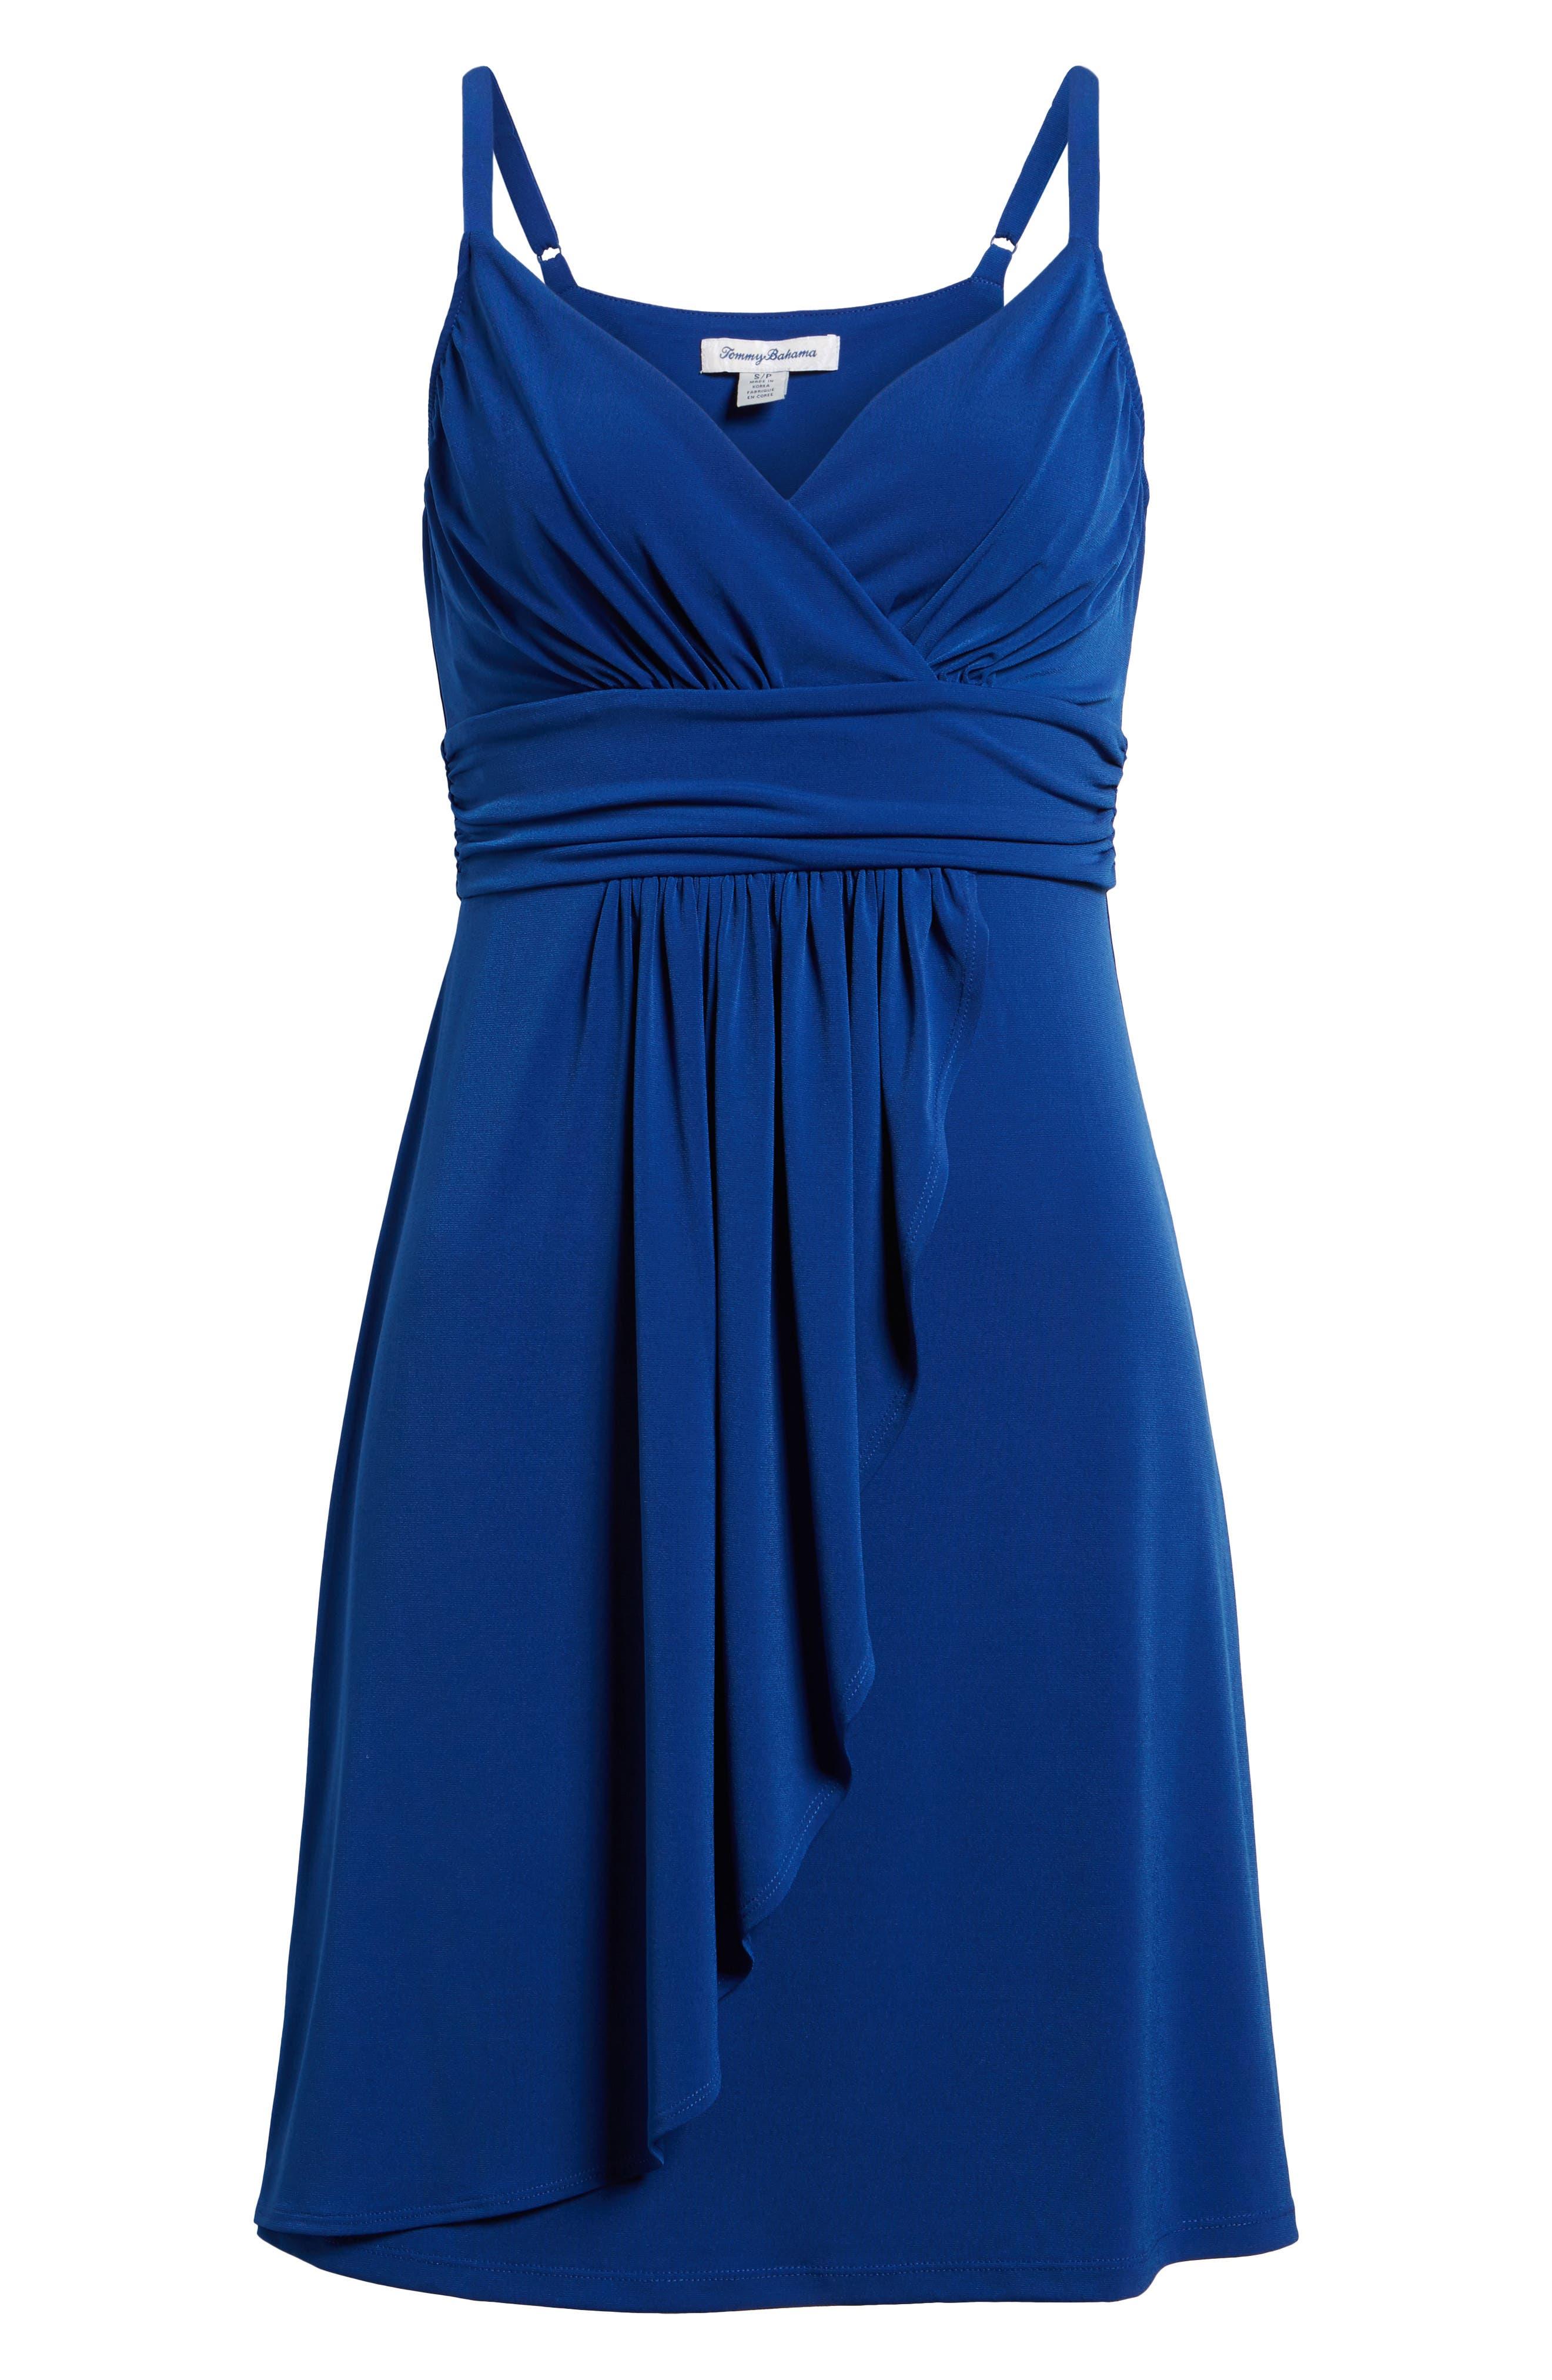 Elenna Stretch Jersey Sundress,                             Alternate thumbnail 6, color,                             DARK BLUE